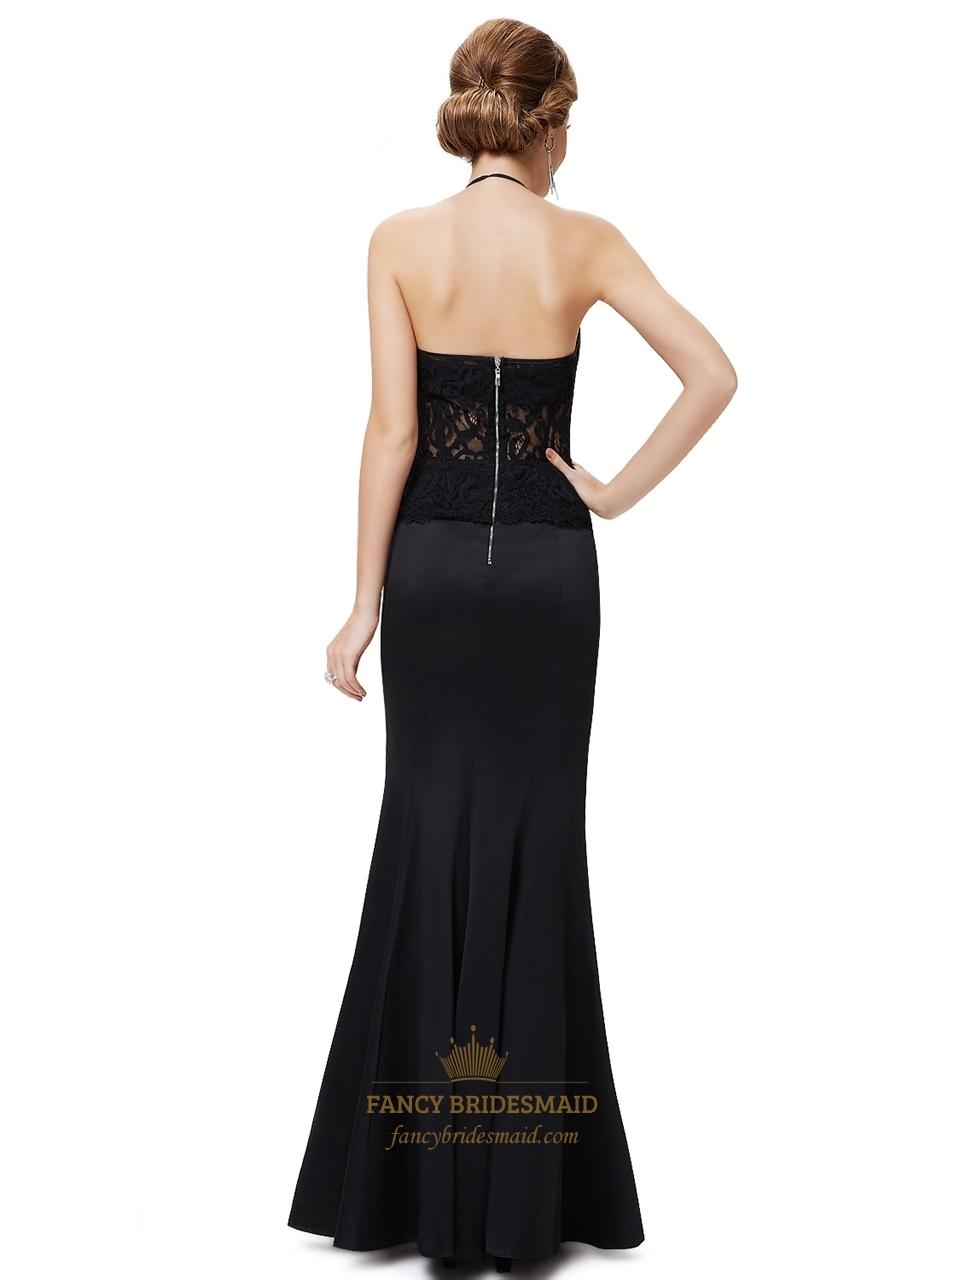 Black Halter Neckline Two Tone Mermaid Prom Dress With